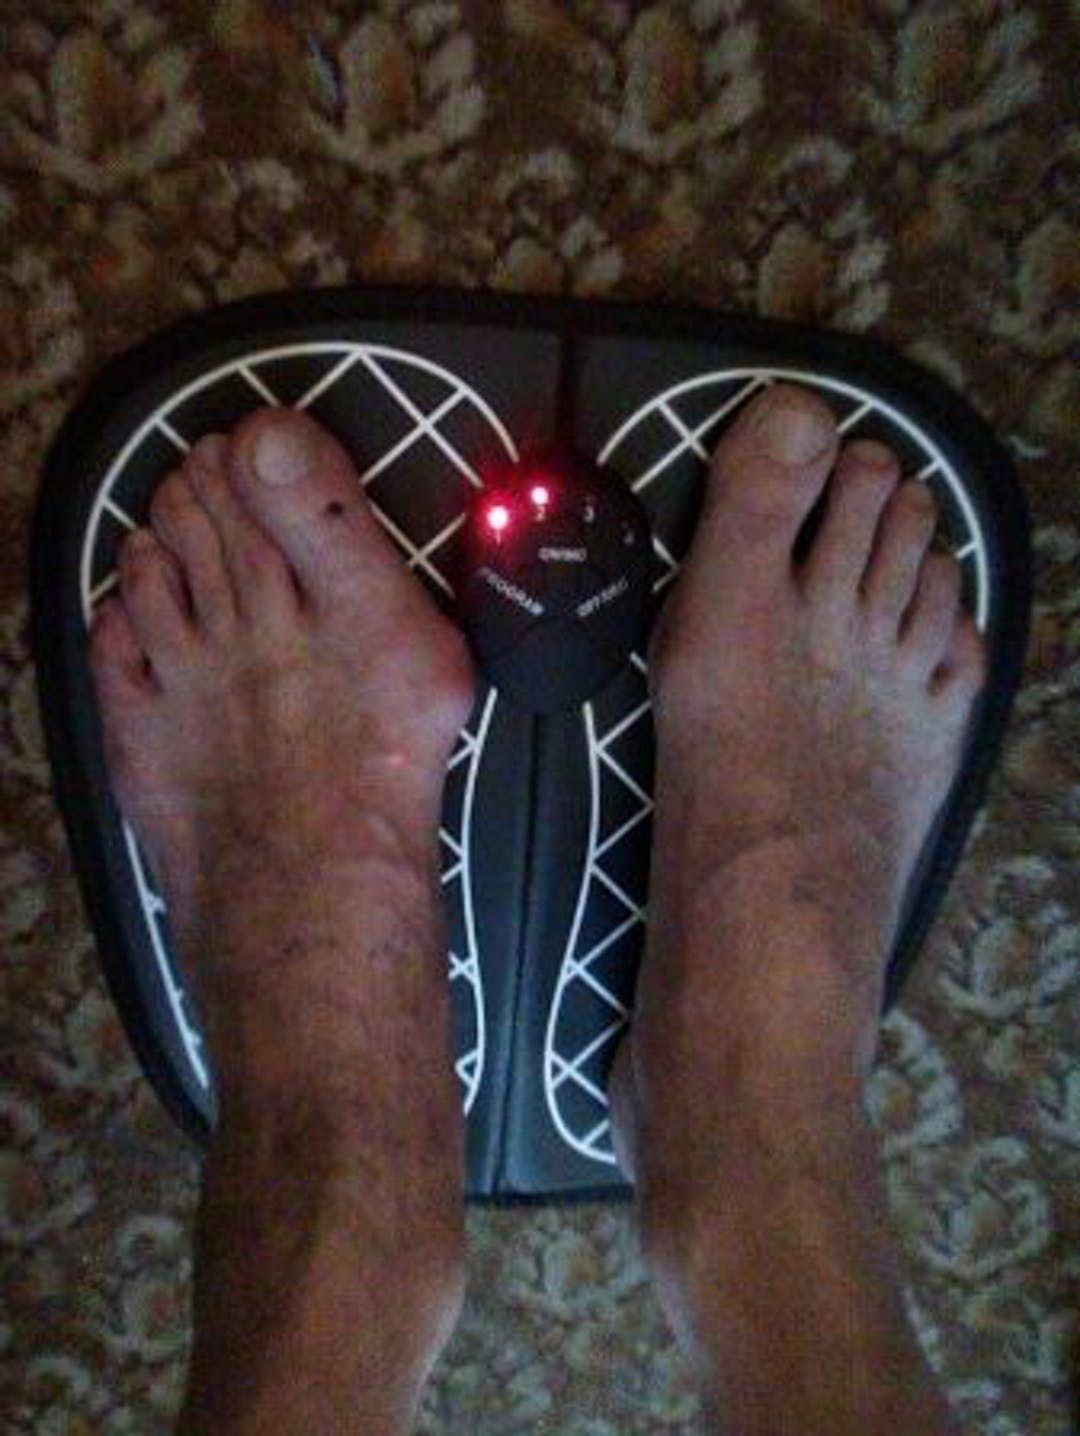 Foot Massage Simulator [50 OFF TODAY] FootLover Foot